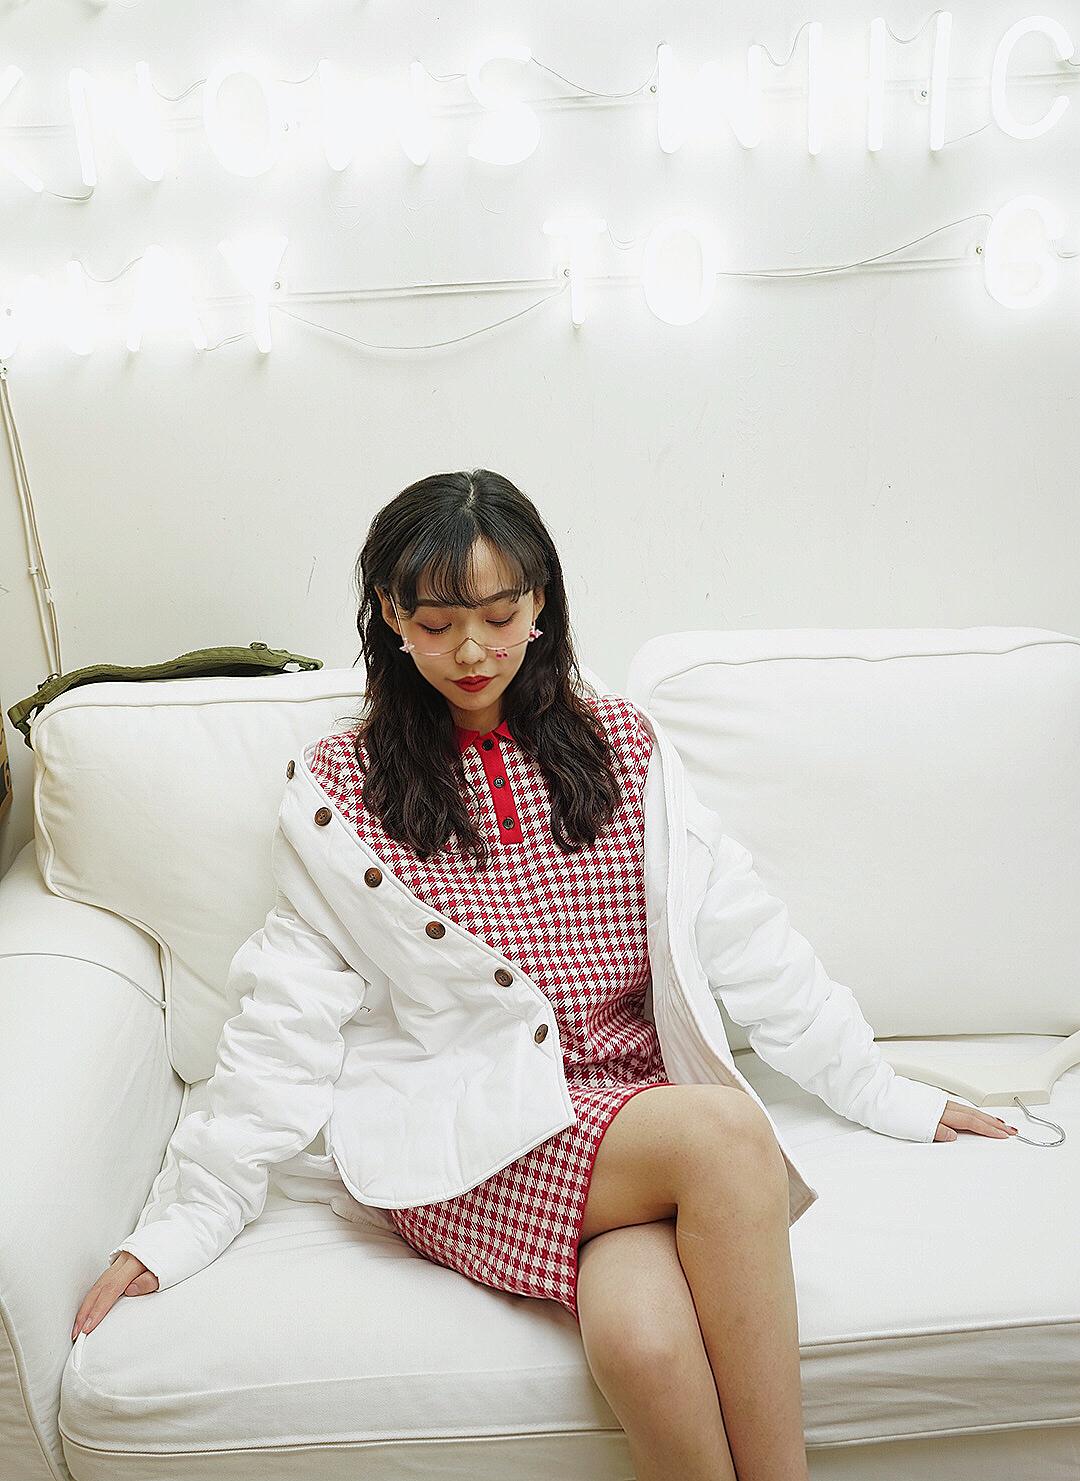 #MOGU探店#甜美风格的红白格子polo裙+白色外套,充满设计感的眼镜框架增加了玩味感。